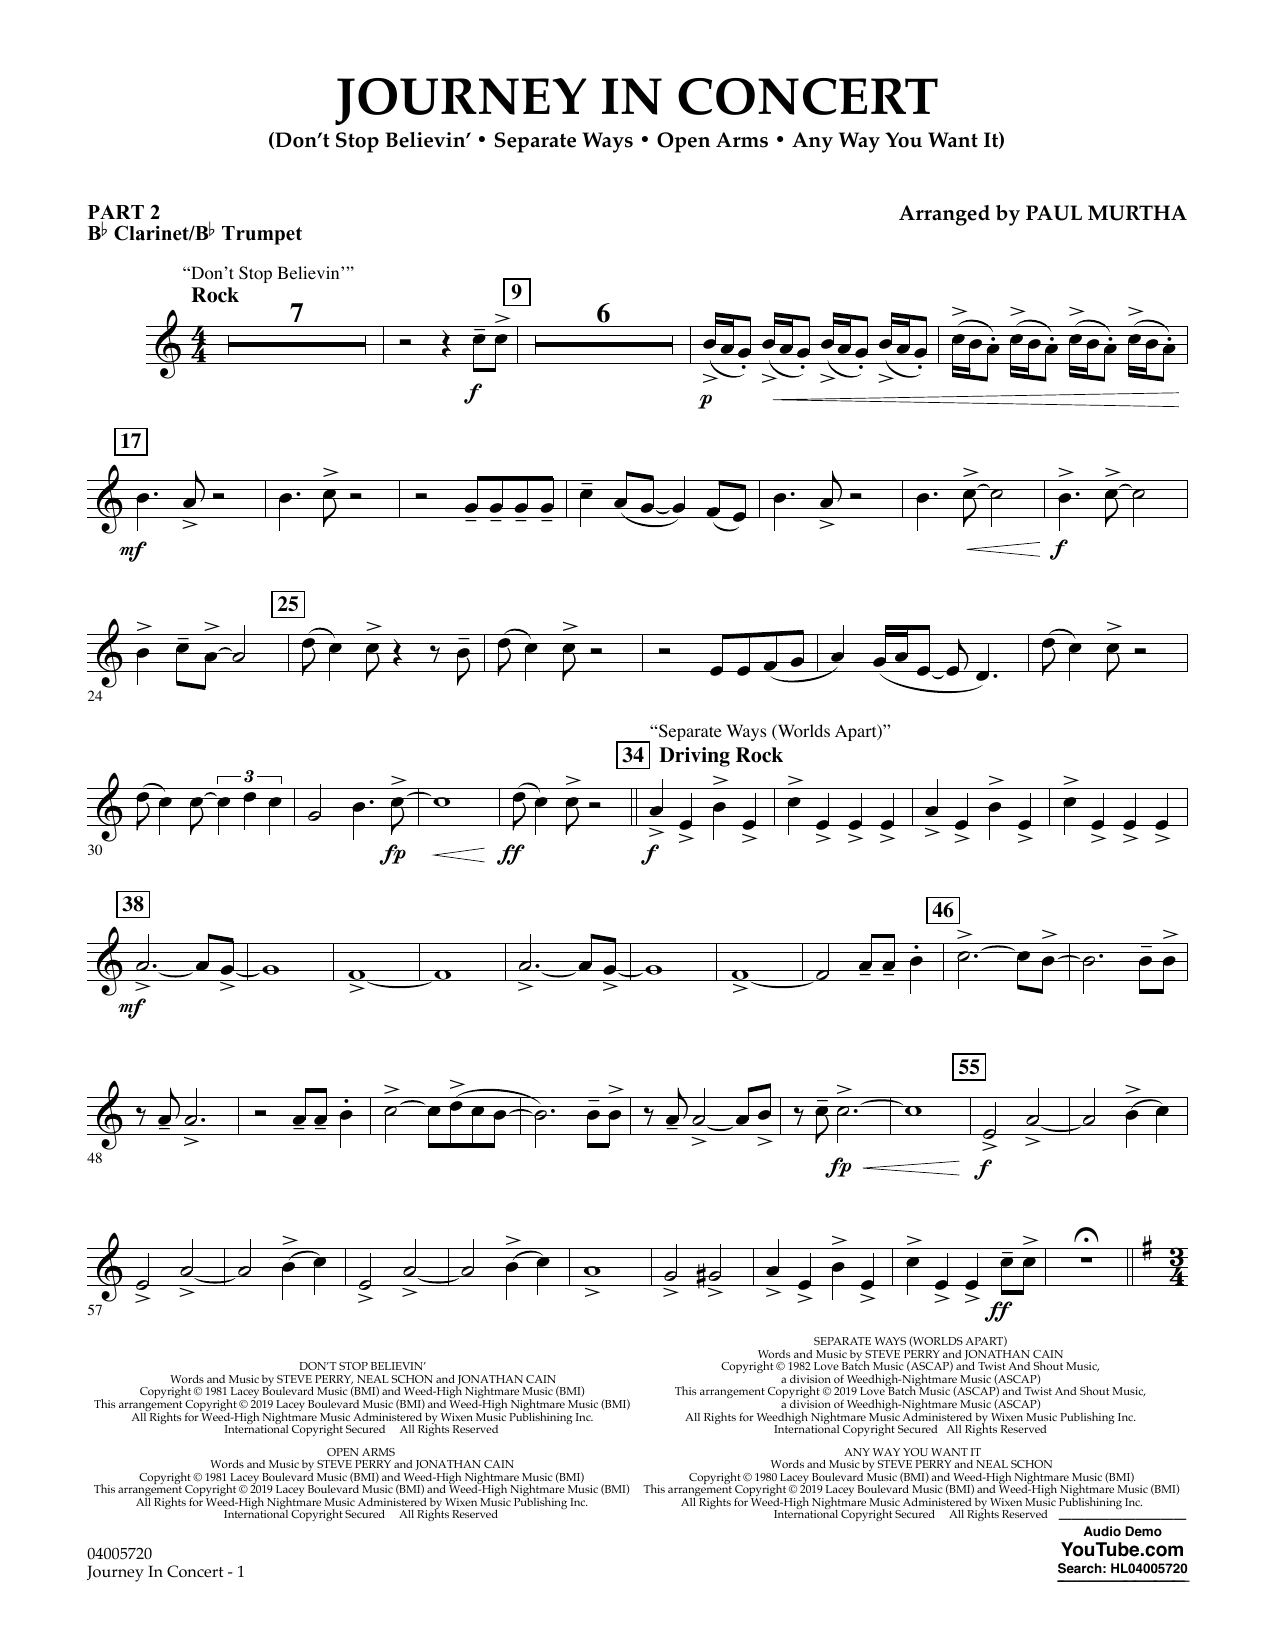 Journey in Concert (arr. Paul Murtha) - Pt.2 - Bb Clarinet/Bb Trumpet (Concert Band: Flex-Band)